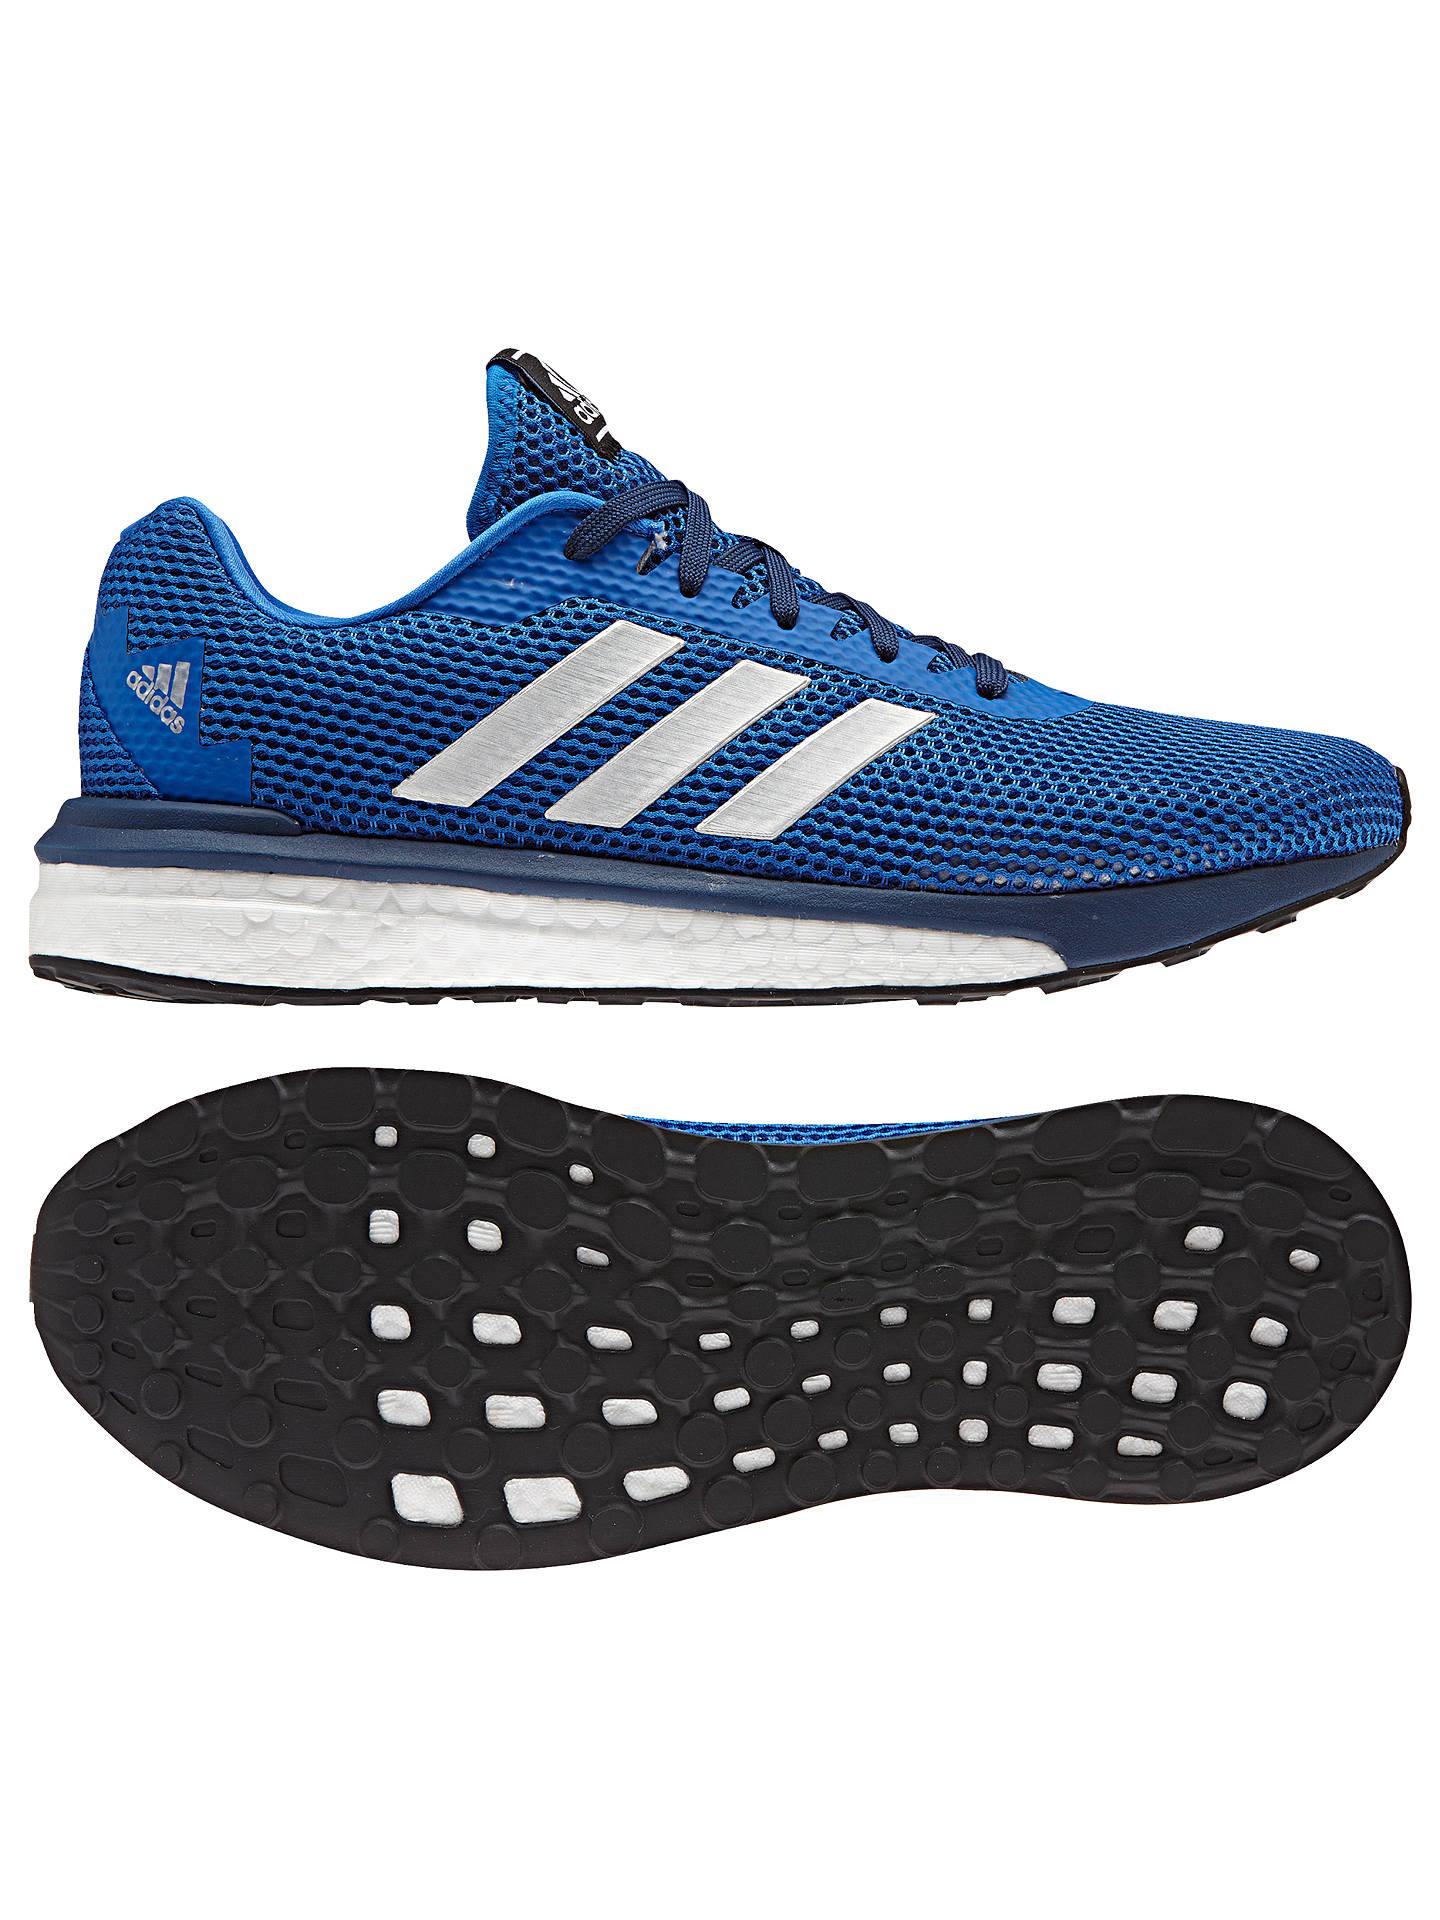 separation shoes 5b4ef c3d62 Adidas Vengeful Men's Running Shoes, Navy at John Lewis ...